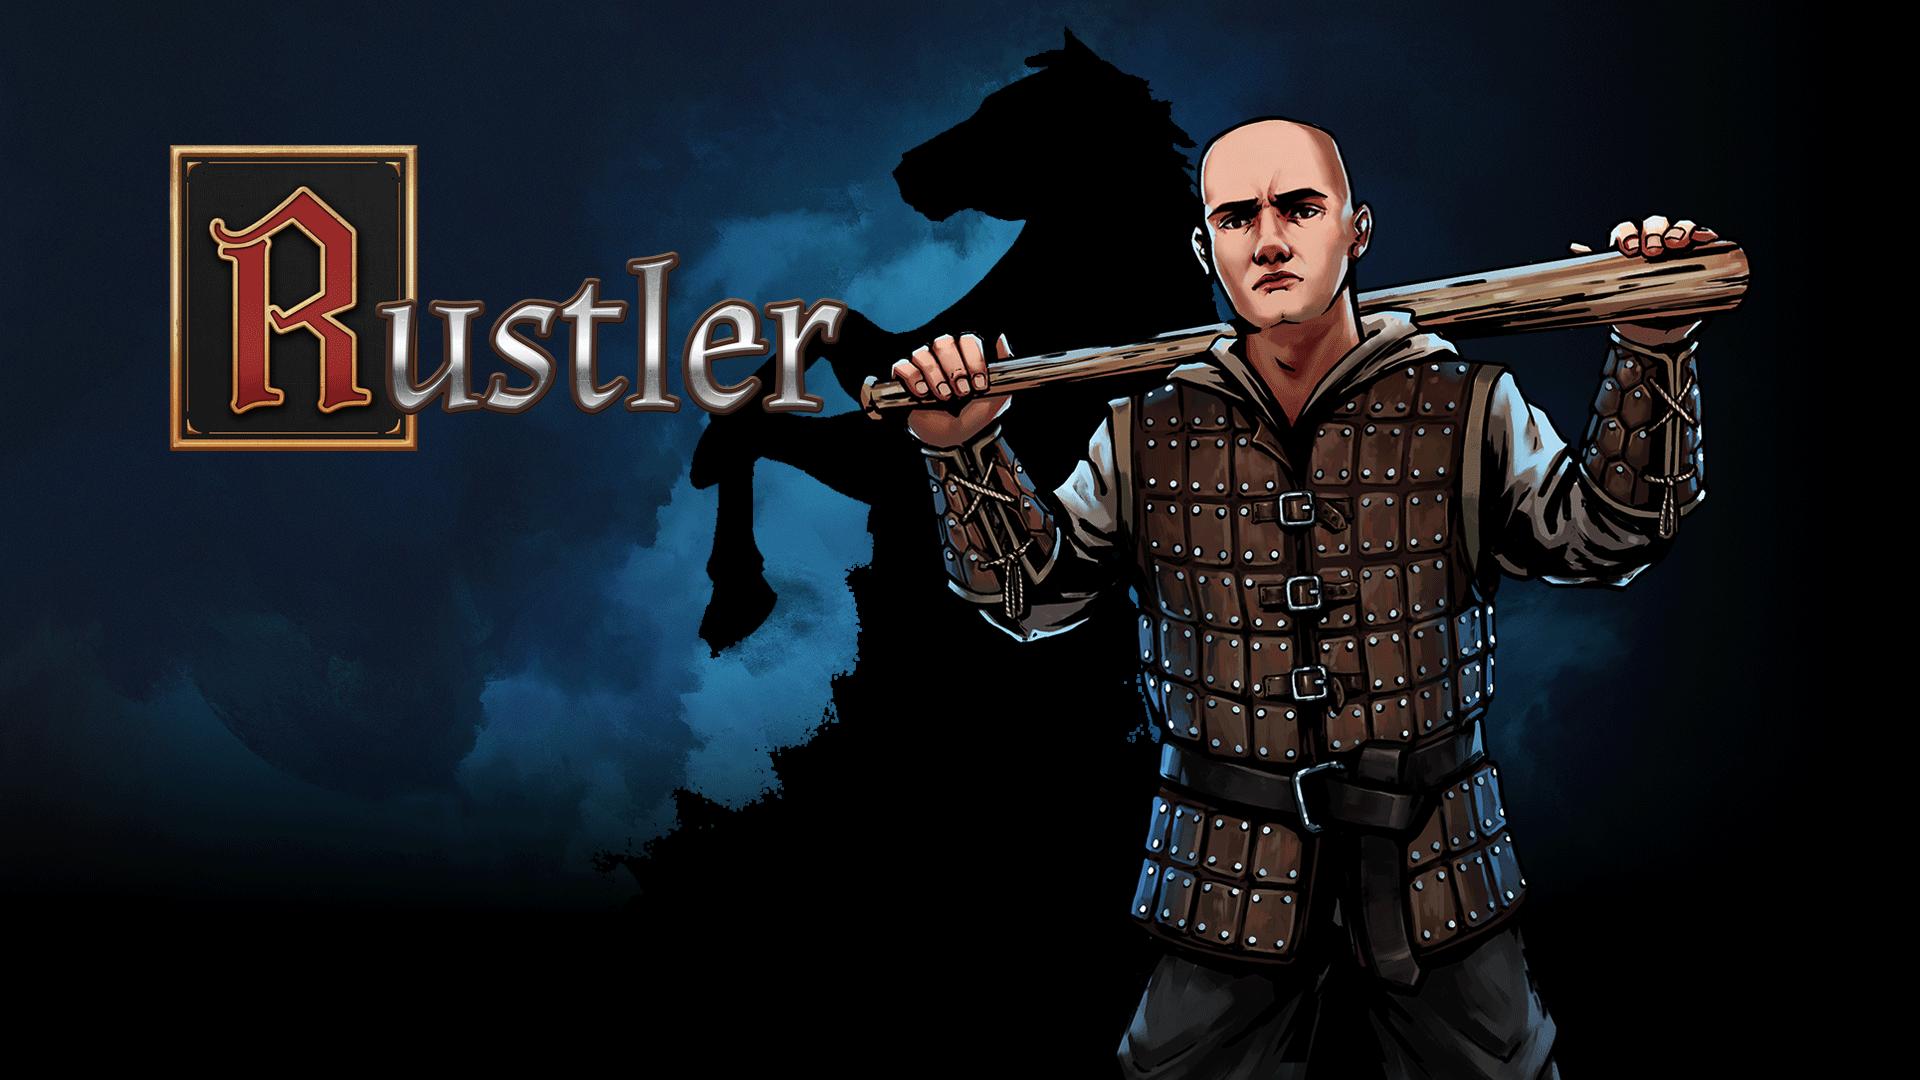 Rustler earlyaccesspreview bg